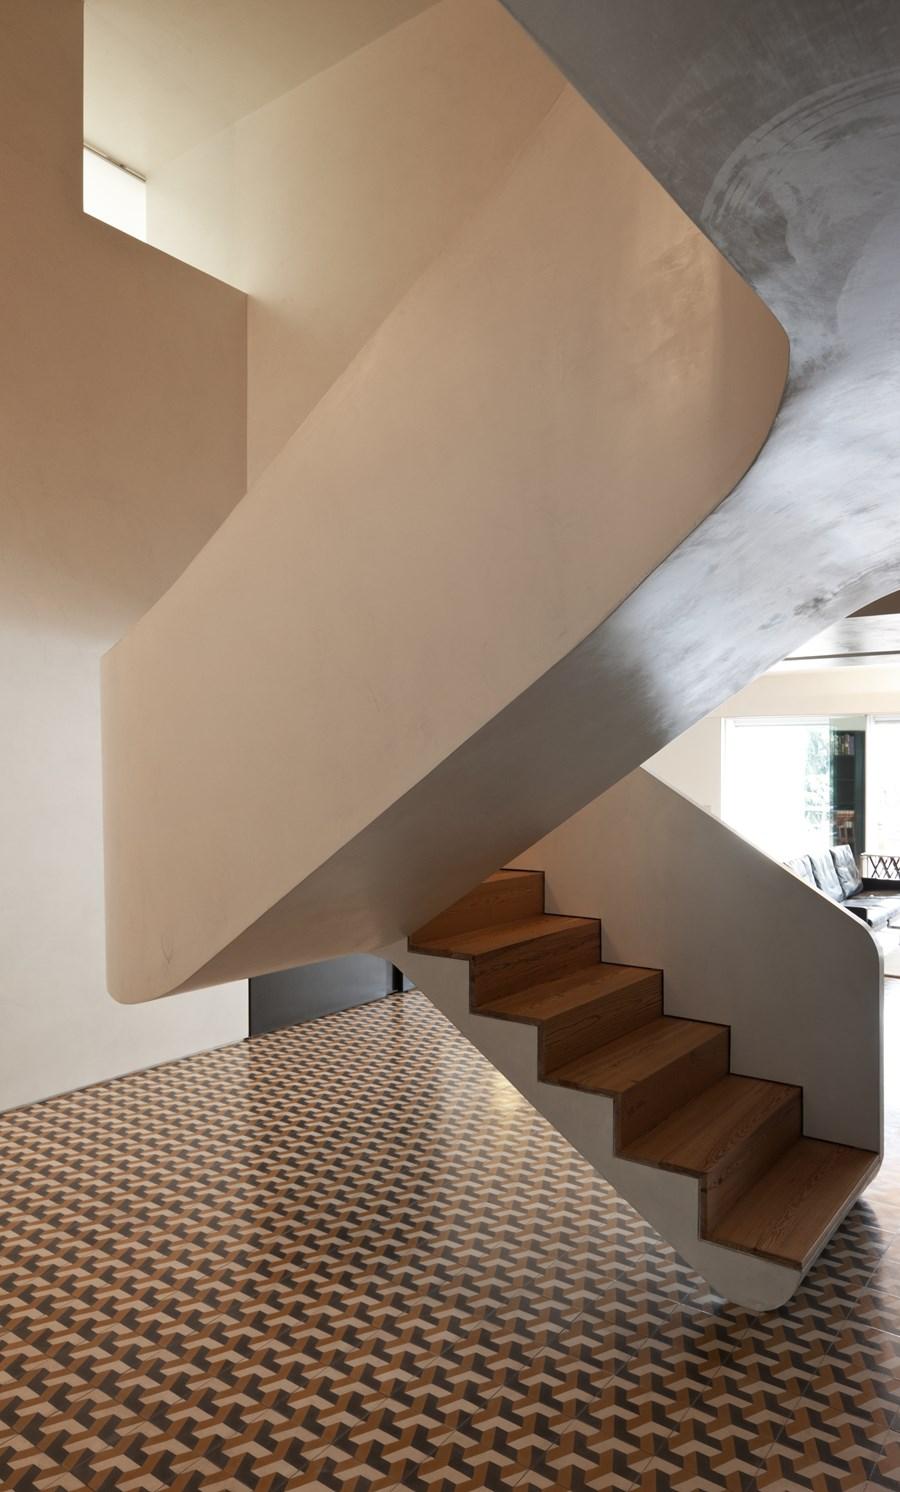 Rehabilitation of an apartment by Correia Ragazzi Arquitectos 16